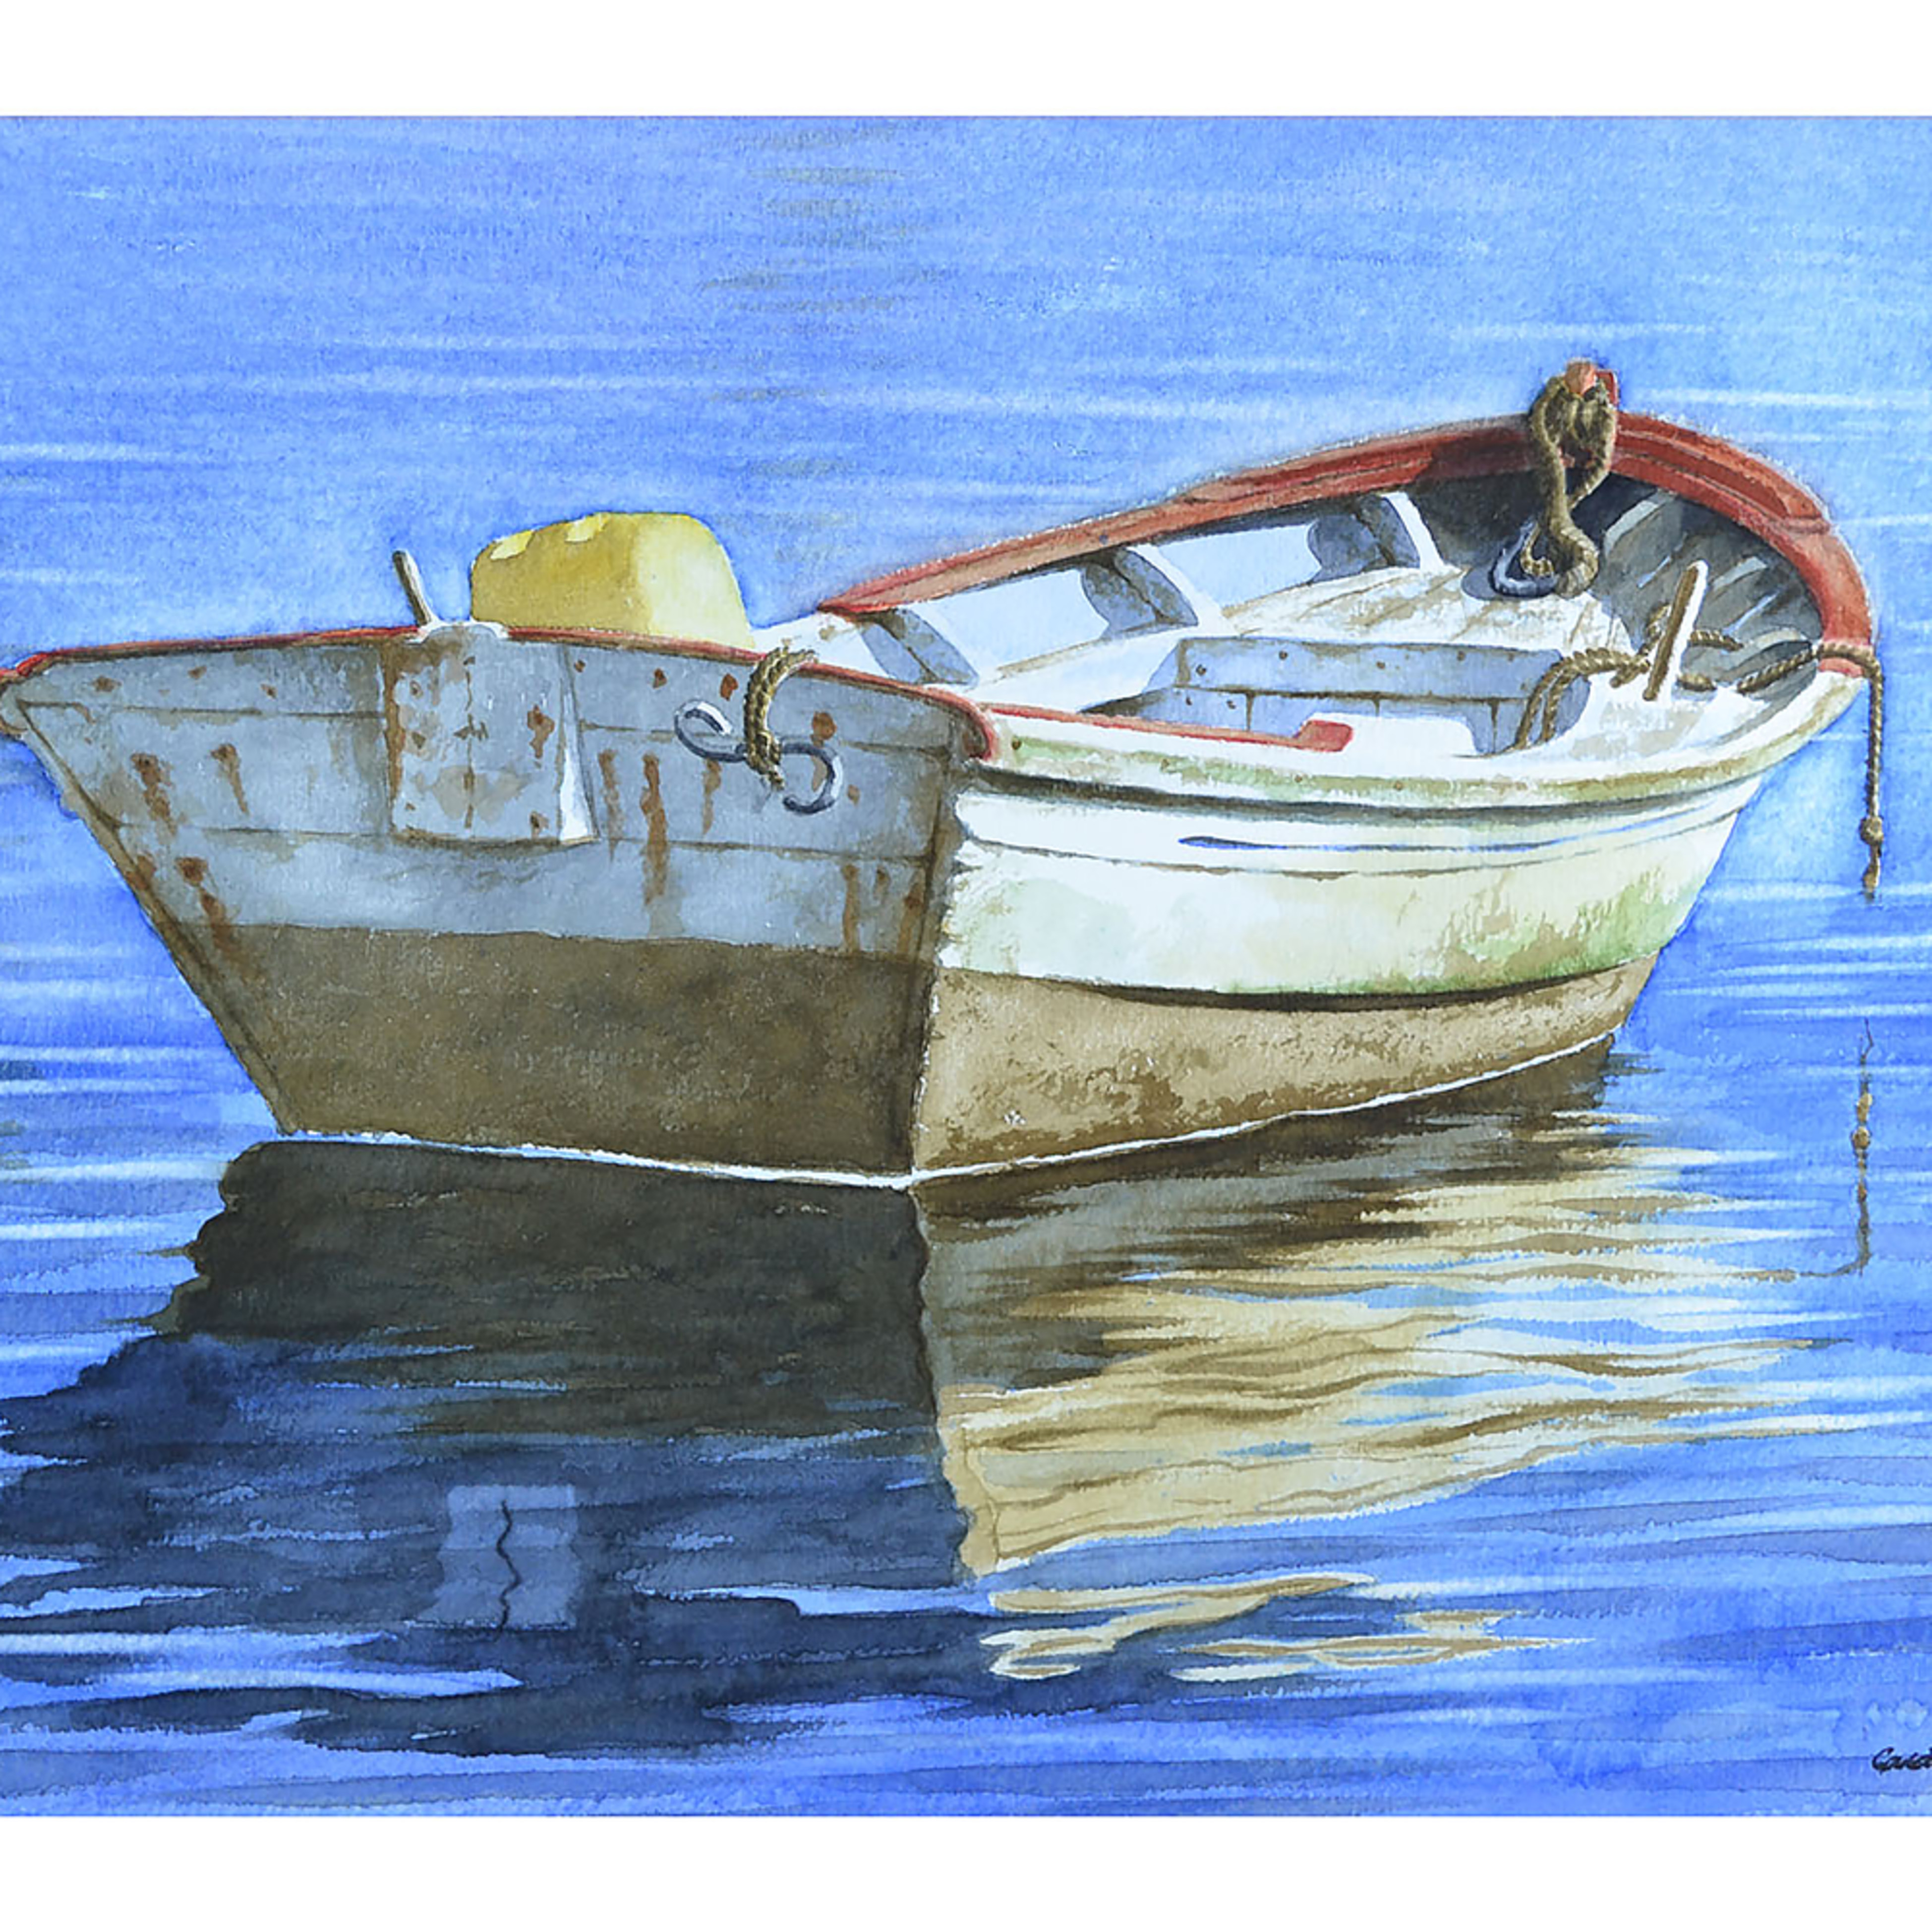 One.boat.adrift fqq4hz